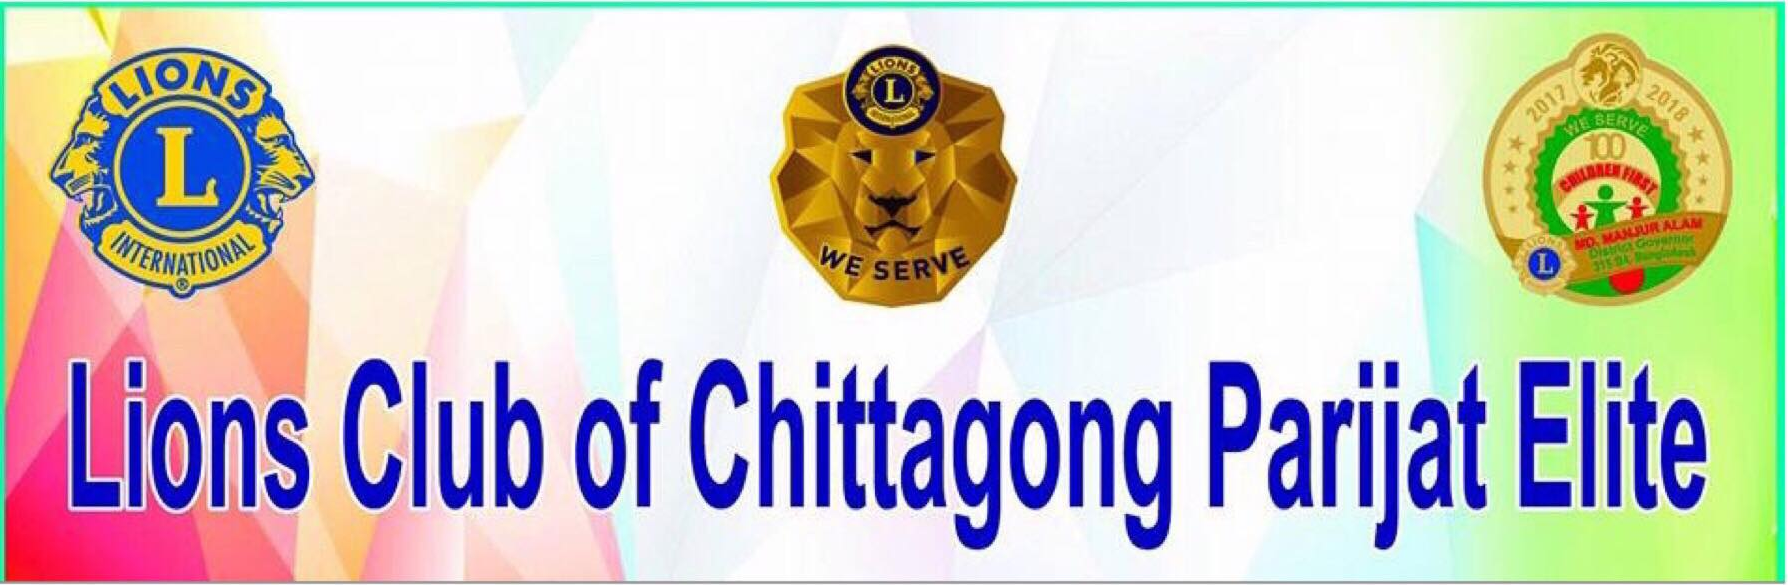 Lions Club of Chittagong Parijat Elite